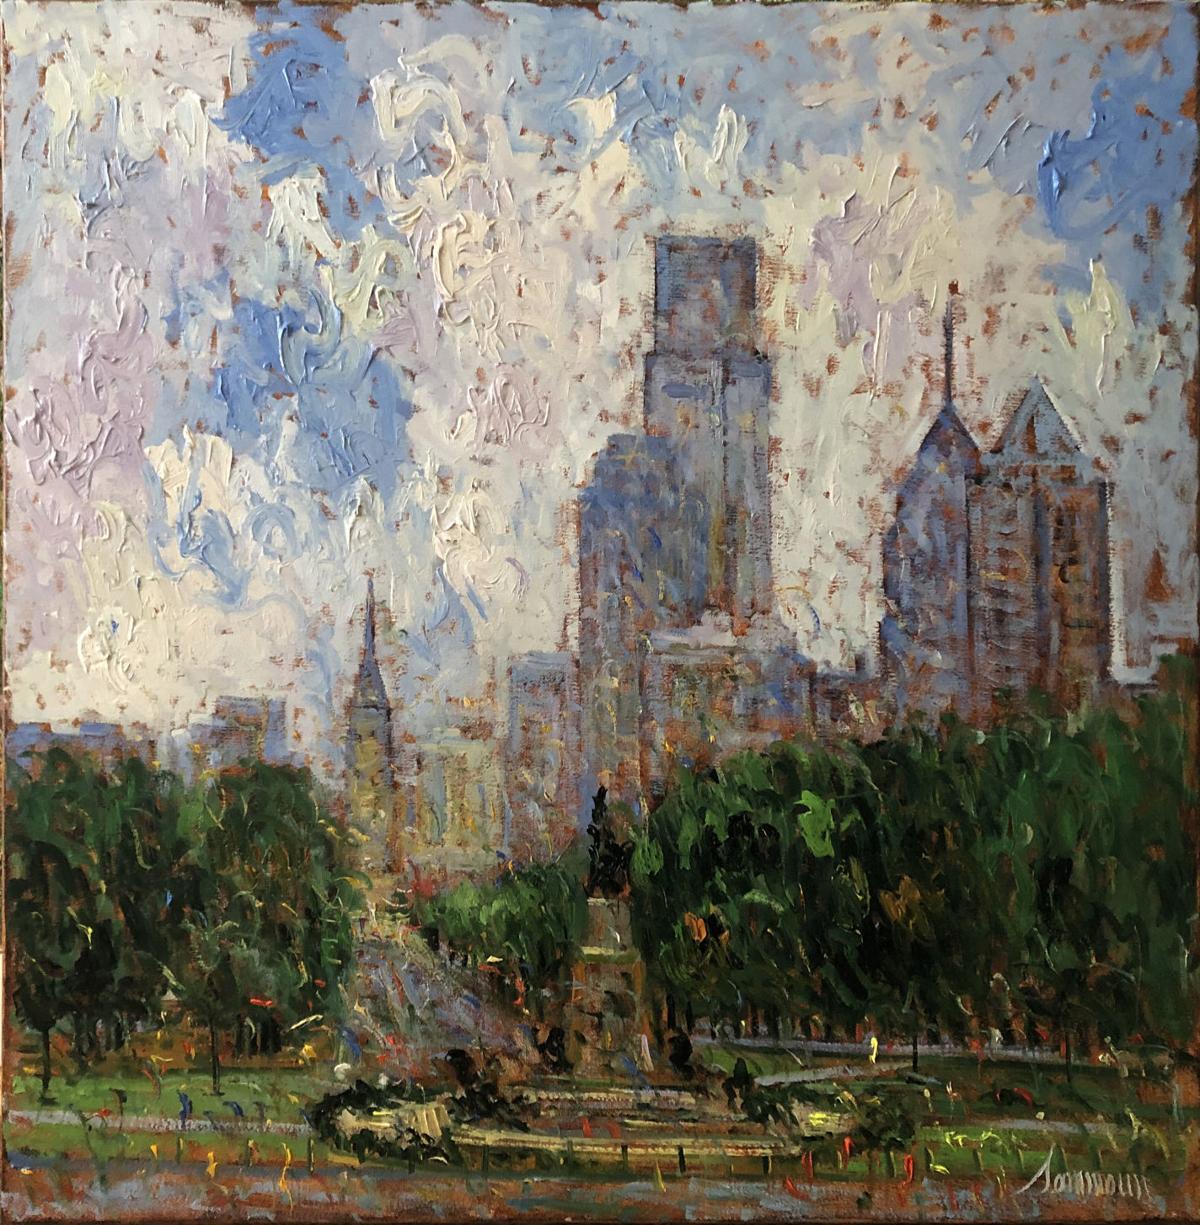 Philadelphia, View from the Museum of Fine Art, 30x30, Copyright Samir Sammoun 2019